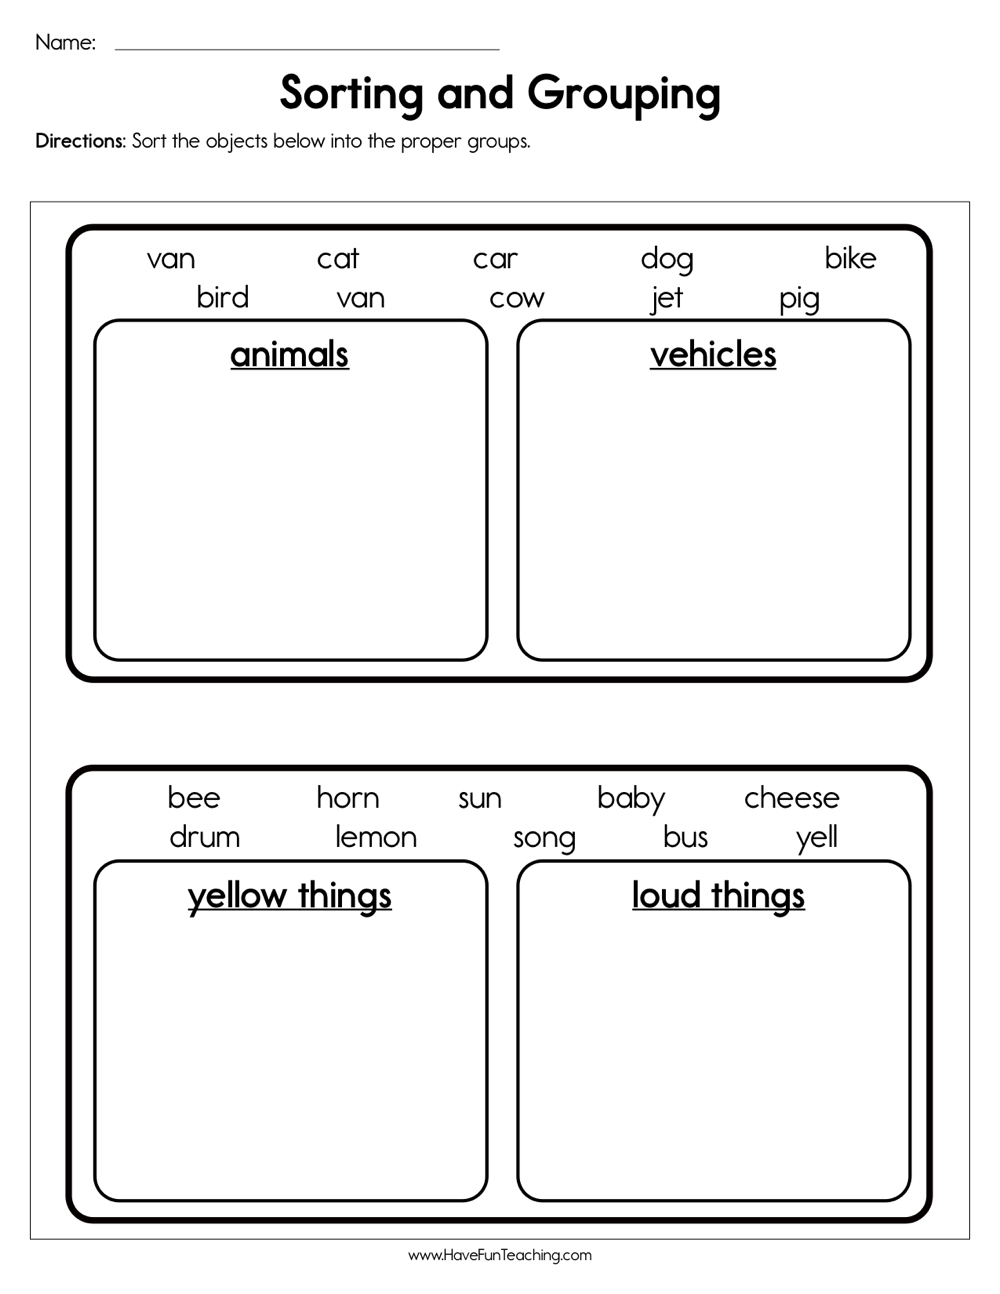 medium resolution of Sorting and Grouping Worksheet • Have Fun Teaching